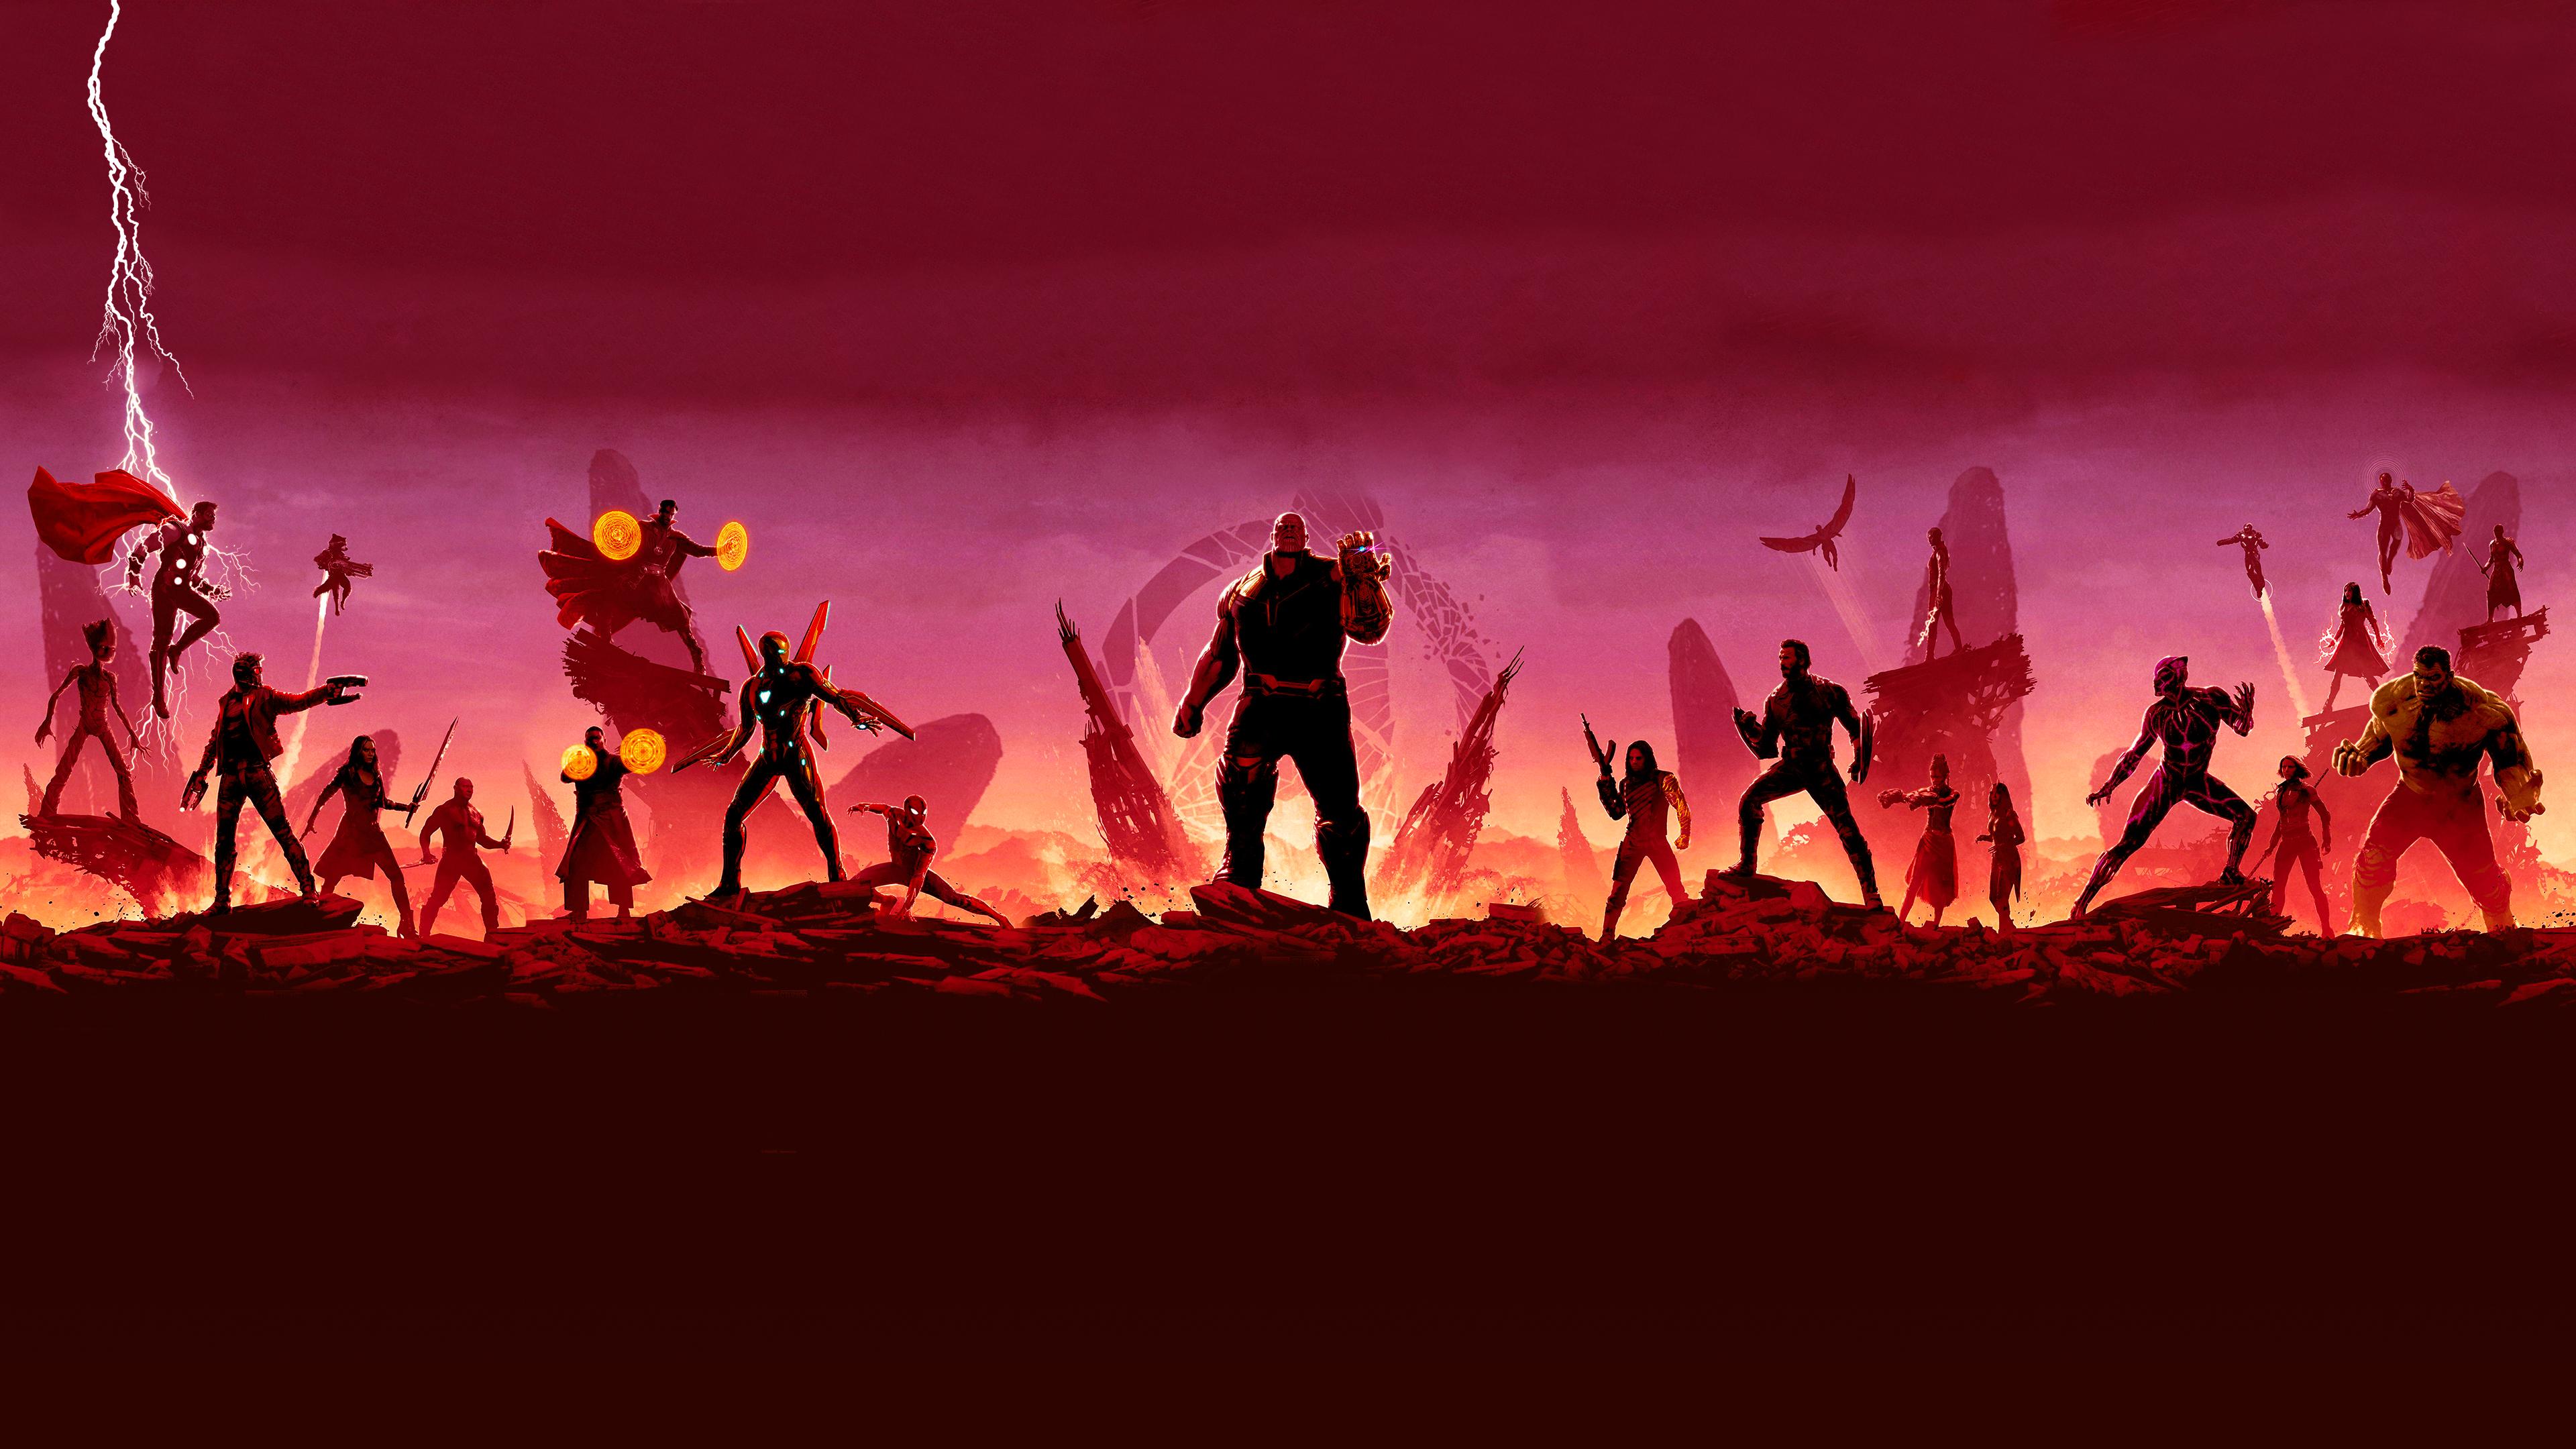 avengers infinity war minimal art 1559764290 - Avengers Infinity War Minimal Art - superheroes wallpapers, minimalist wallpapers, minimalism wallpapers, hd-wallpapers, avengers-wallpapers, avengers-infinity-war-wallpapers, 4k-wallpapers